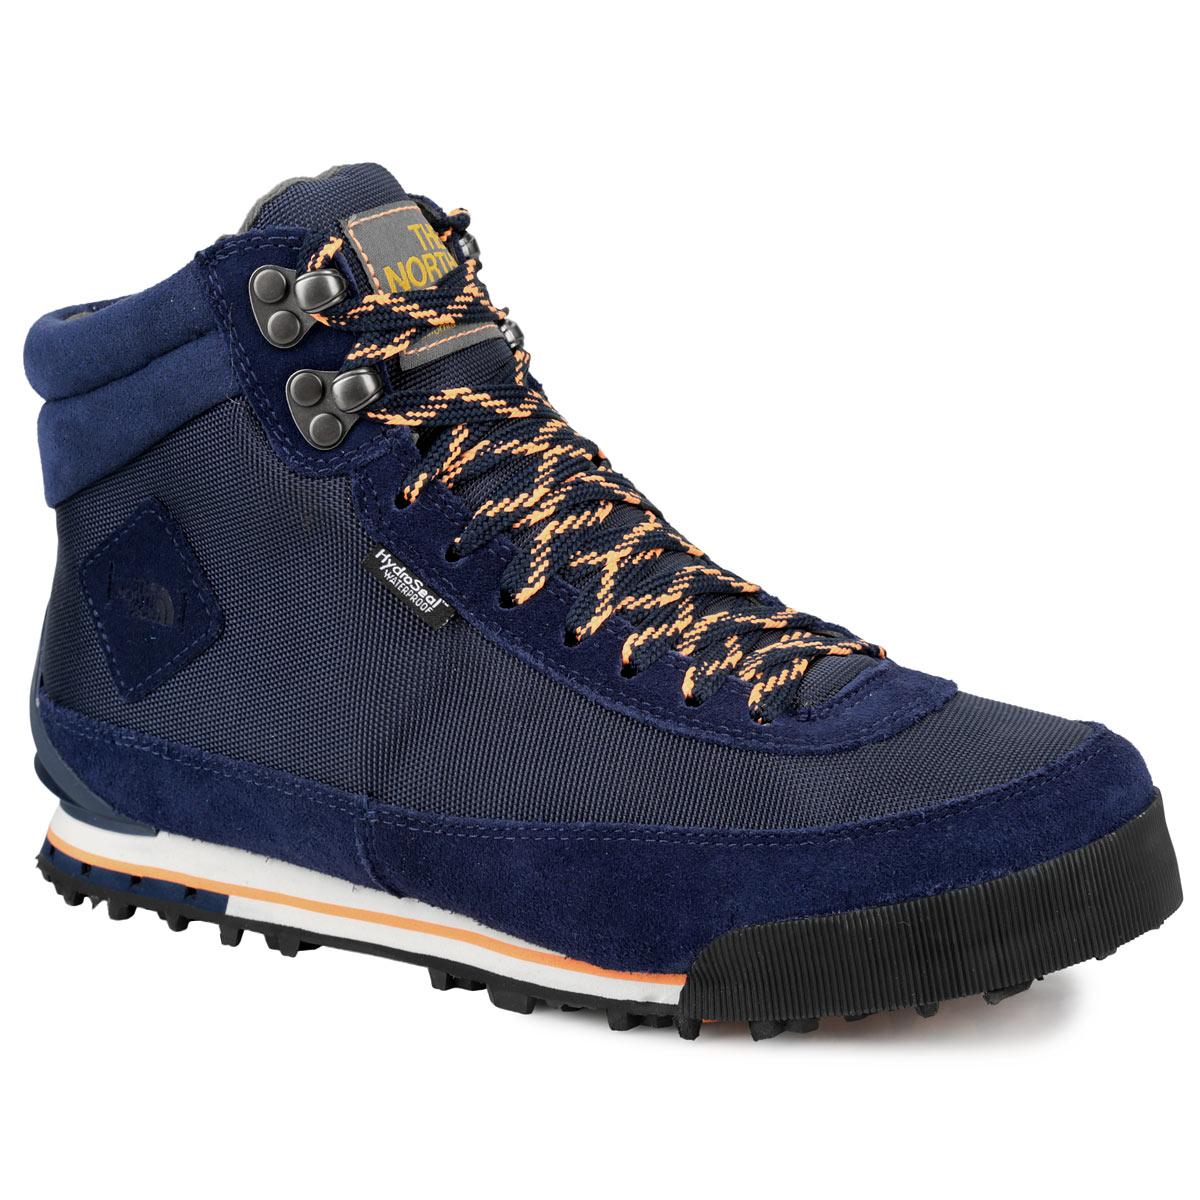 Ботинки The North Face T0A1MFDSJ